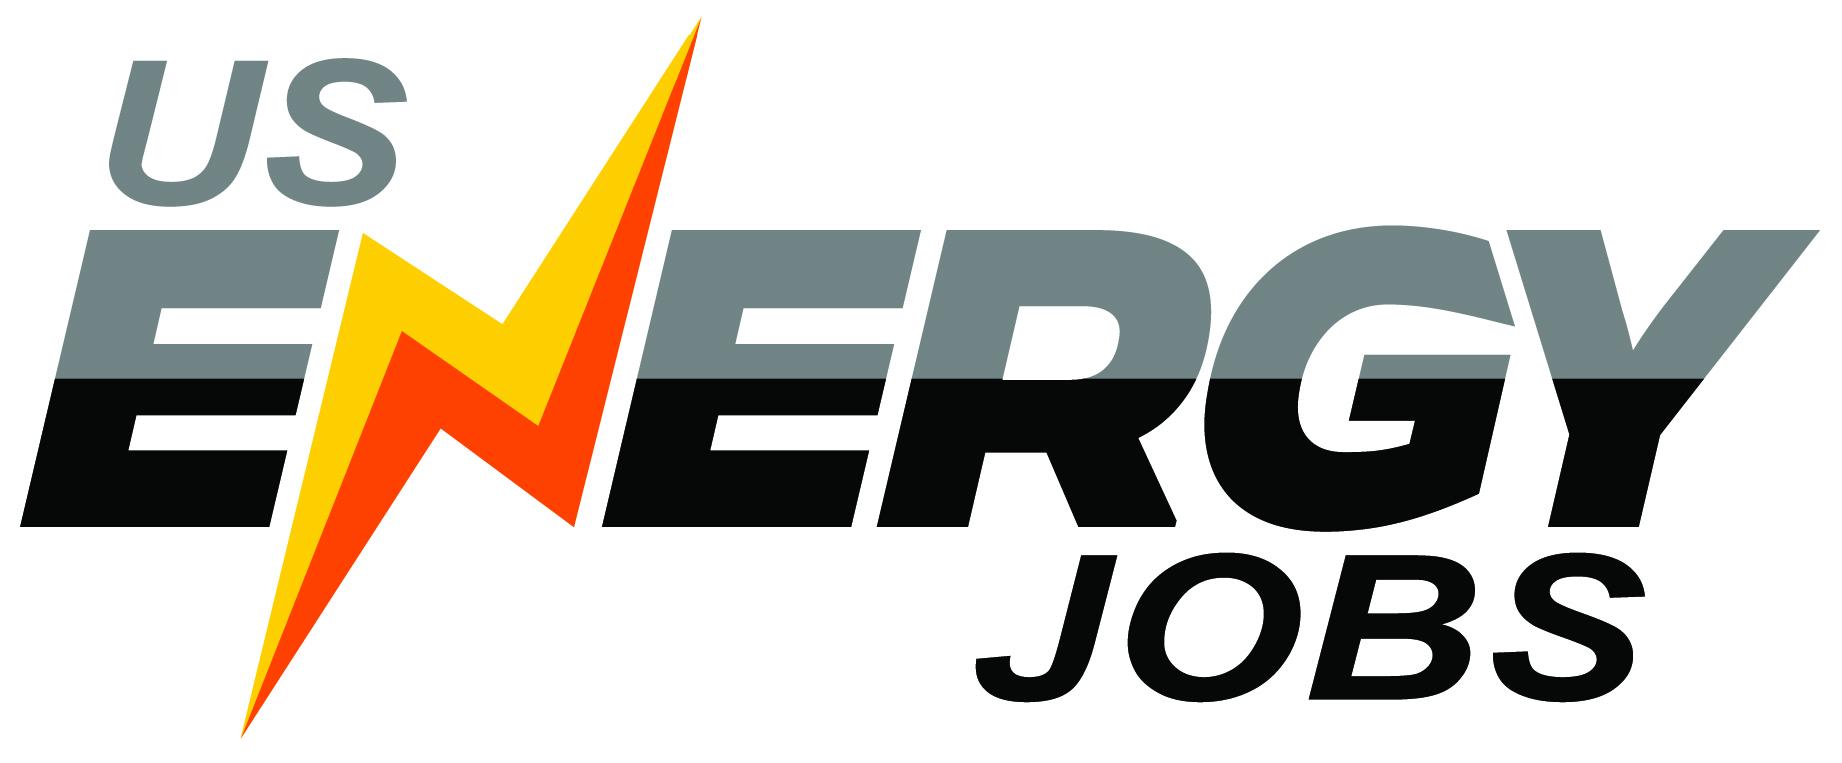 USEnergyJobs.com